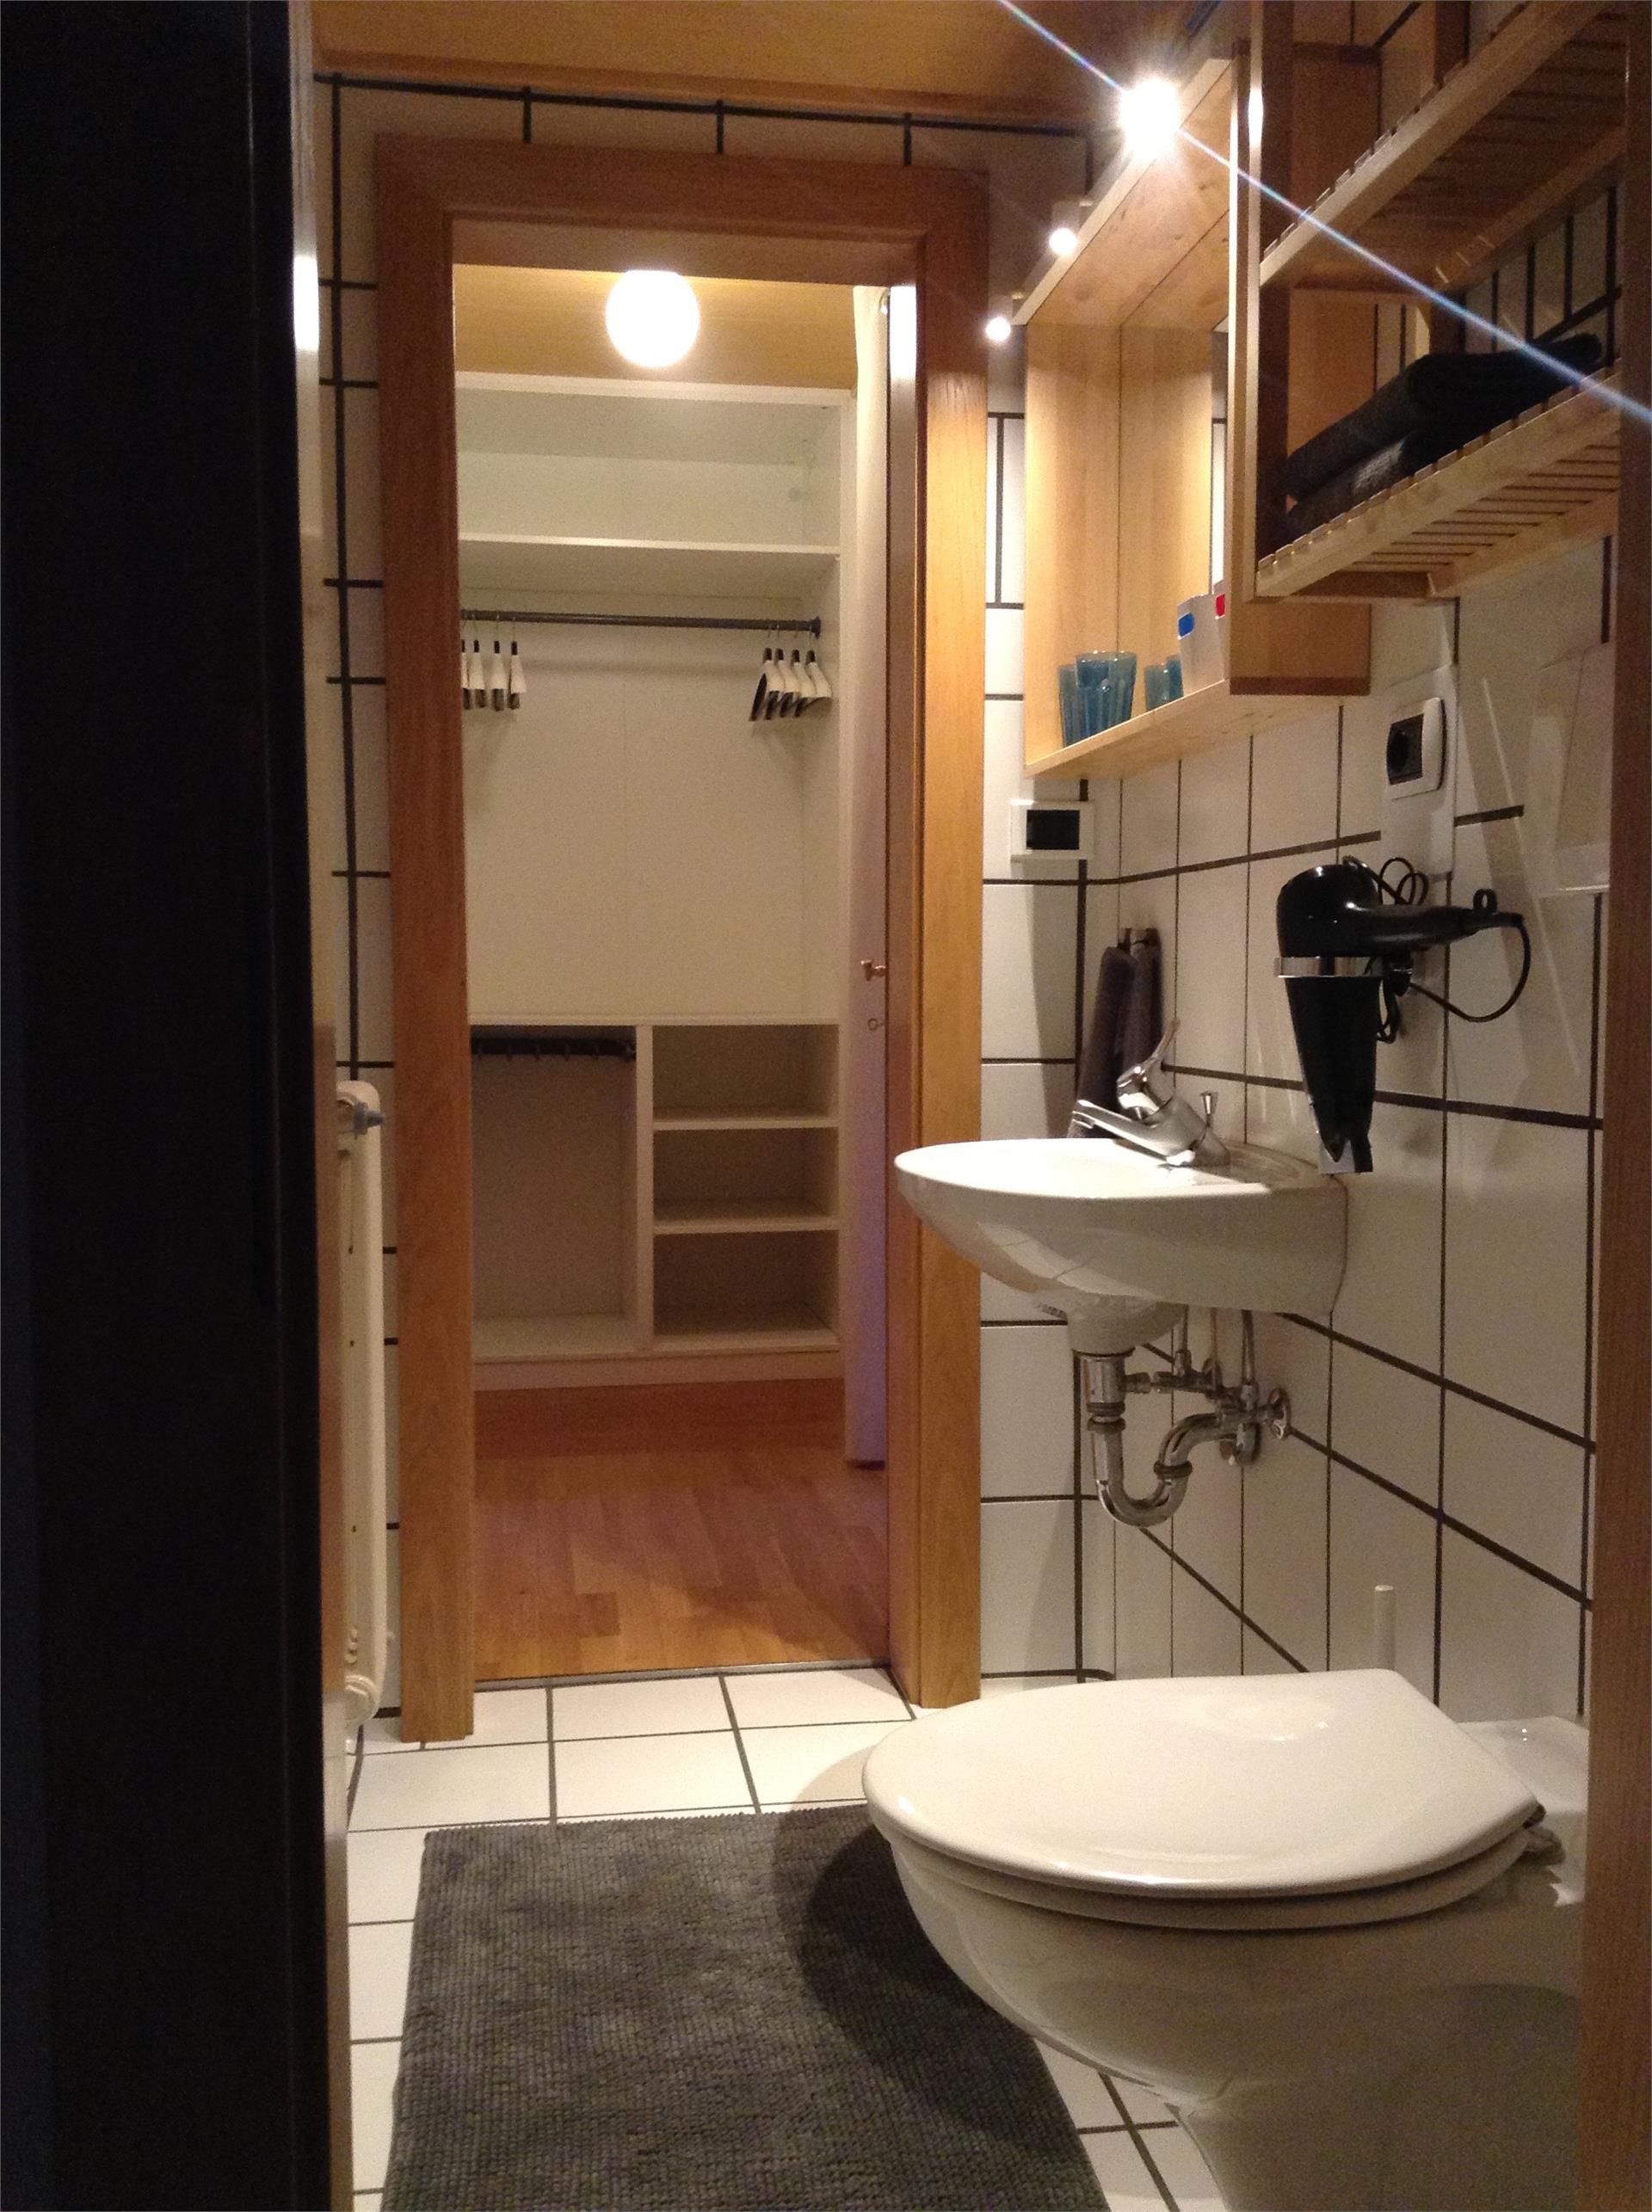 2 bathroom appartment 3